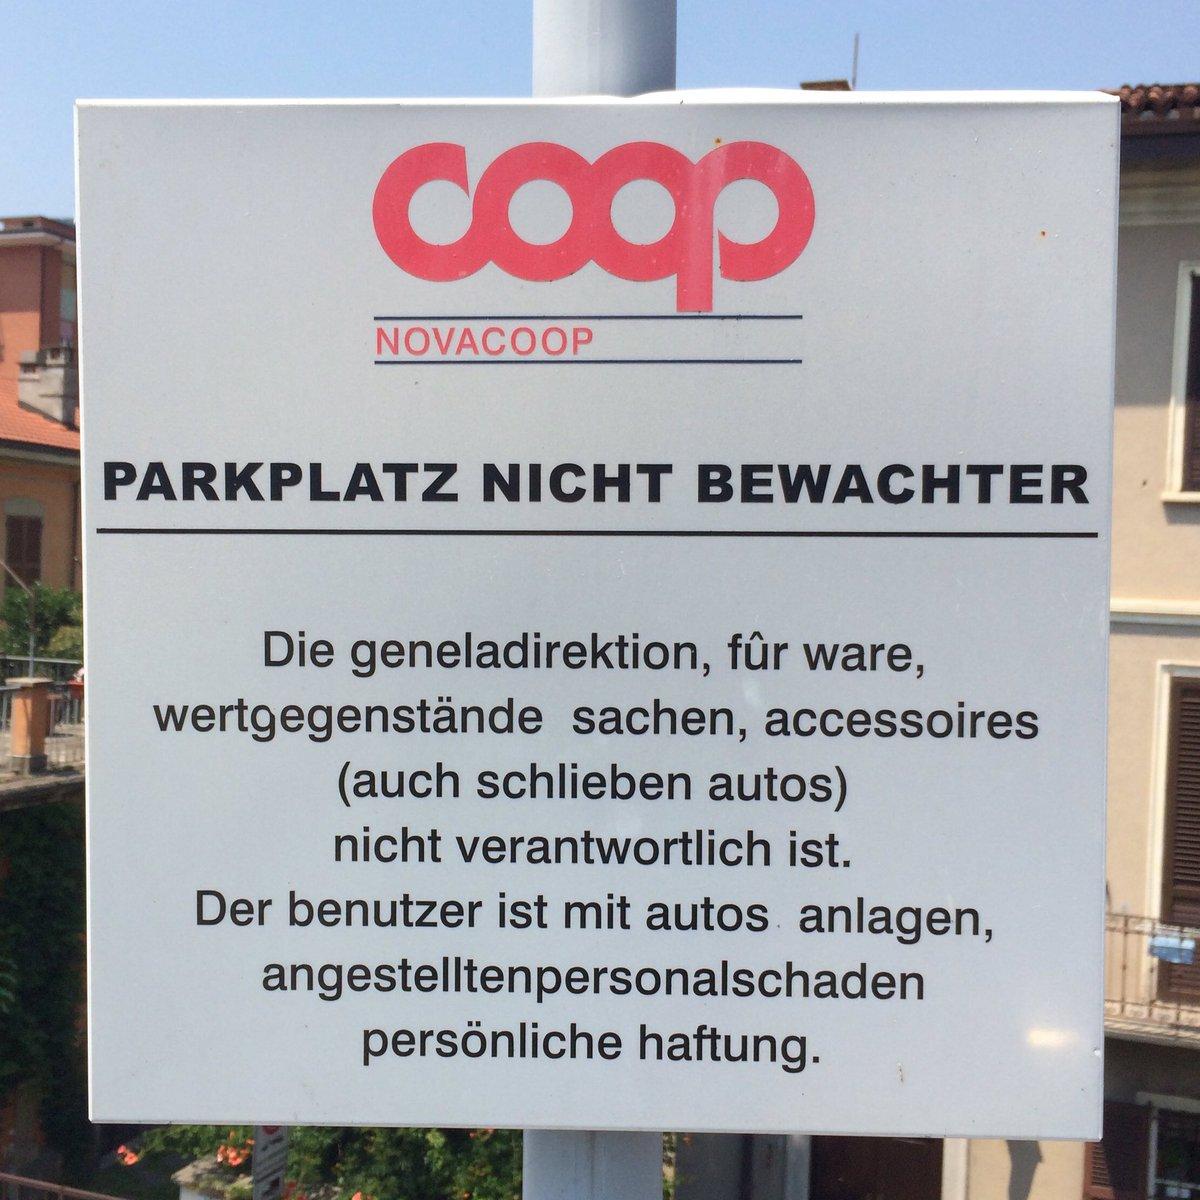 Google translate german to english - 349